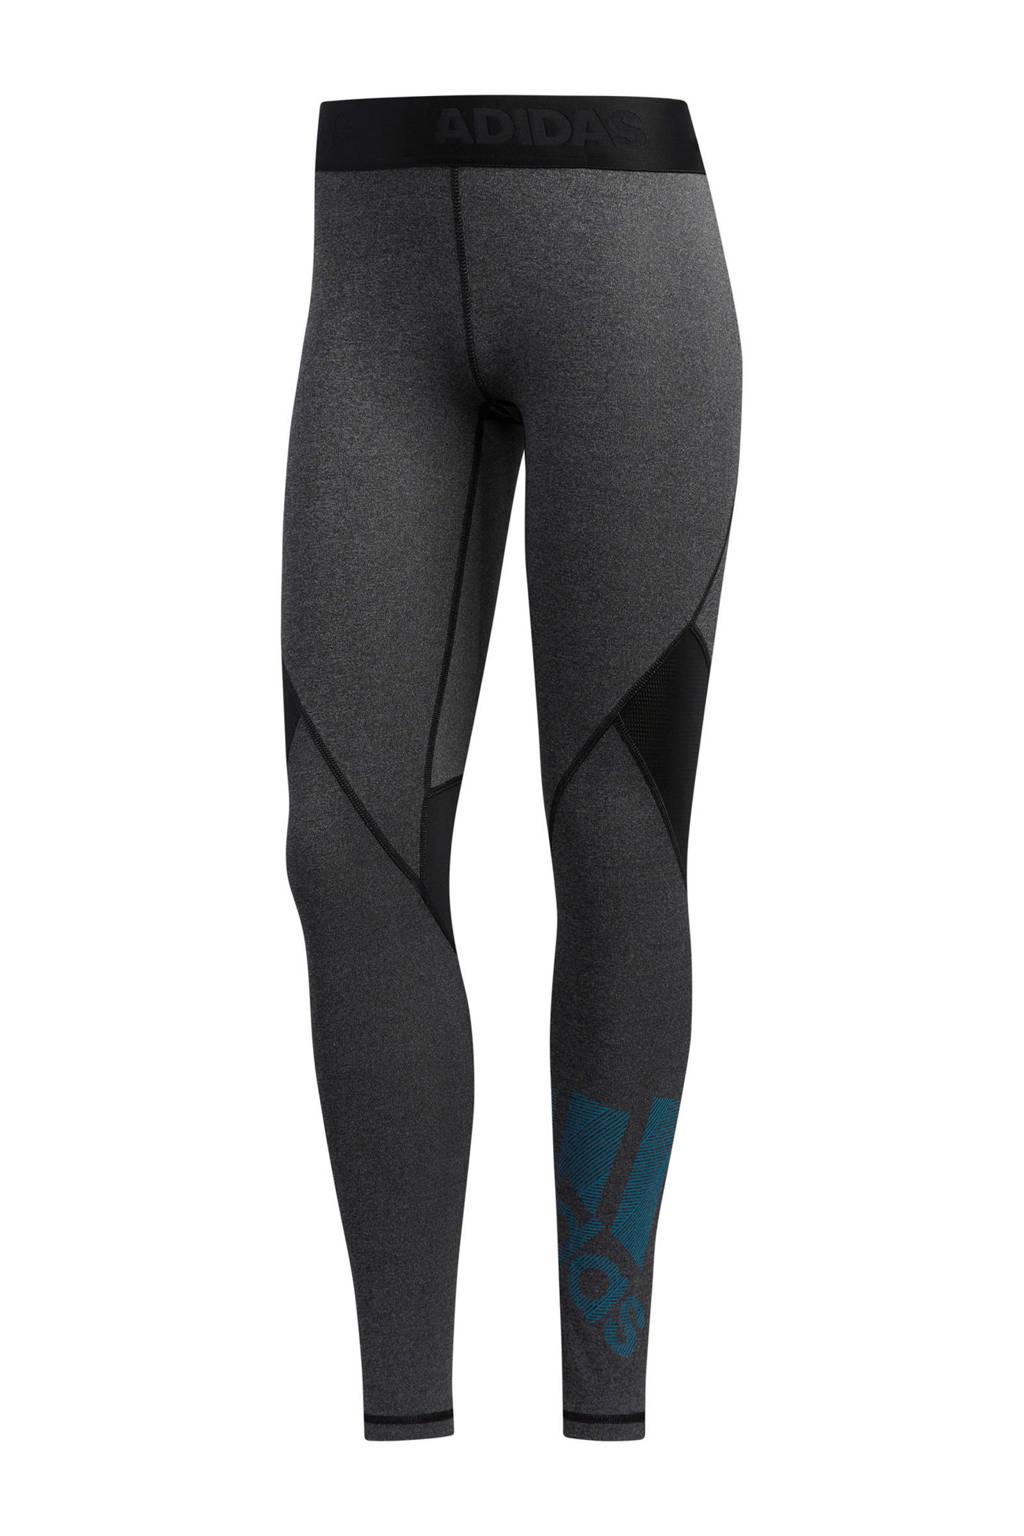 adidas performance sportbroek zwart/grijs, Zwart/grijs